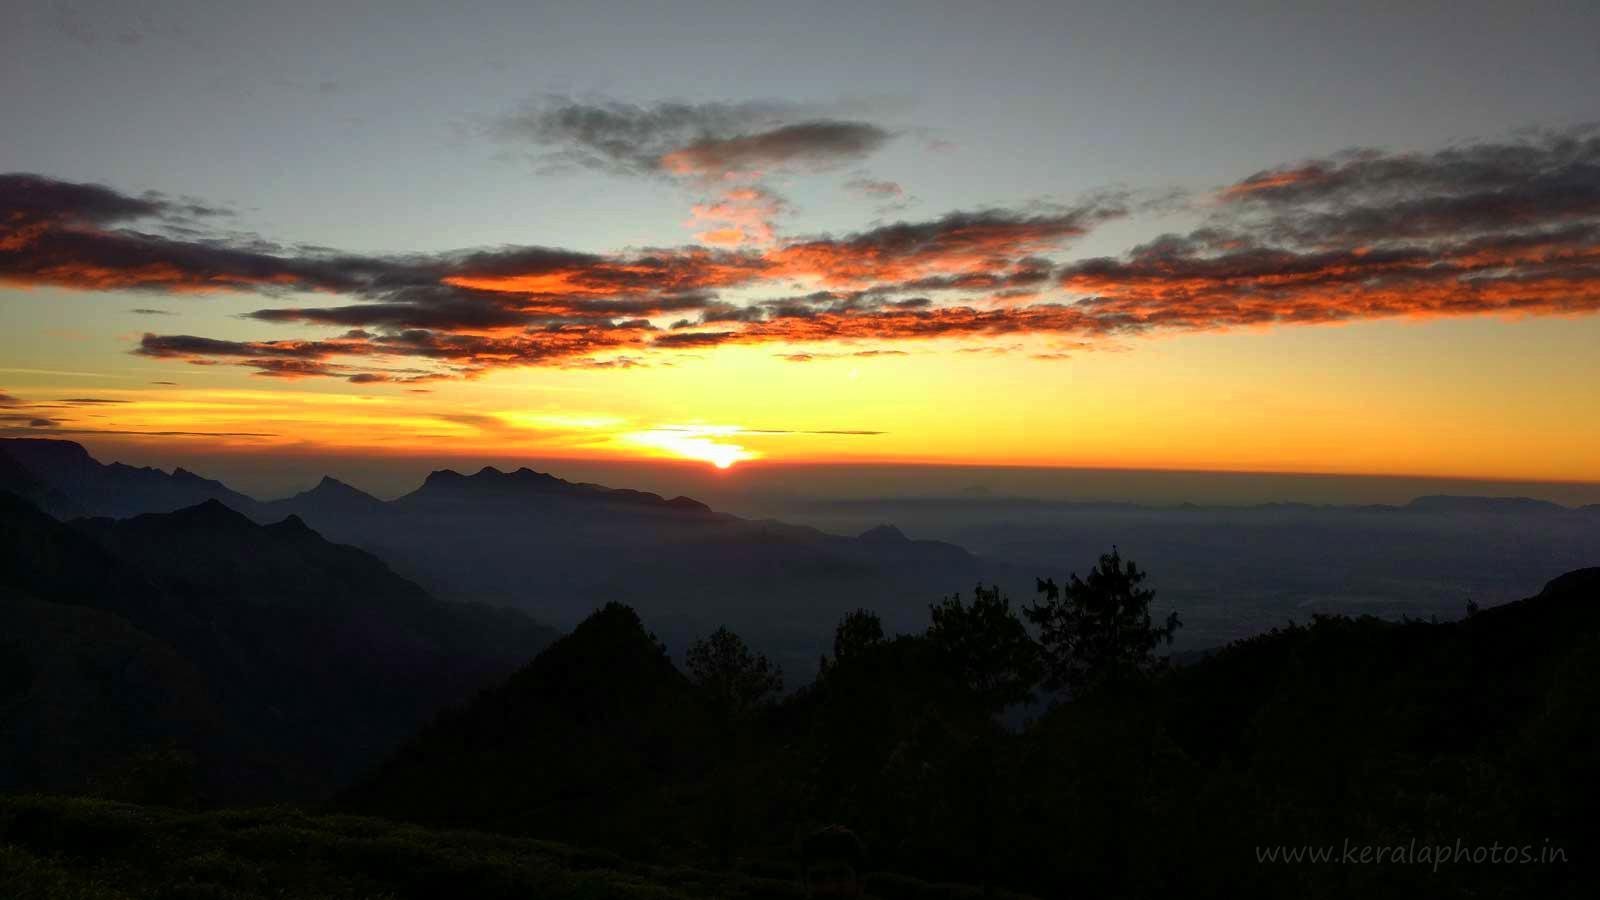 Drawn sunrise kerala scenery Which sunrise Meesapulimala  A